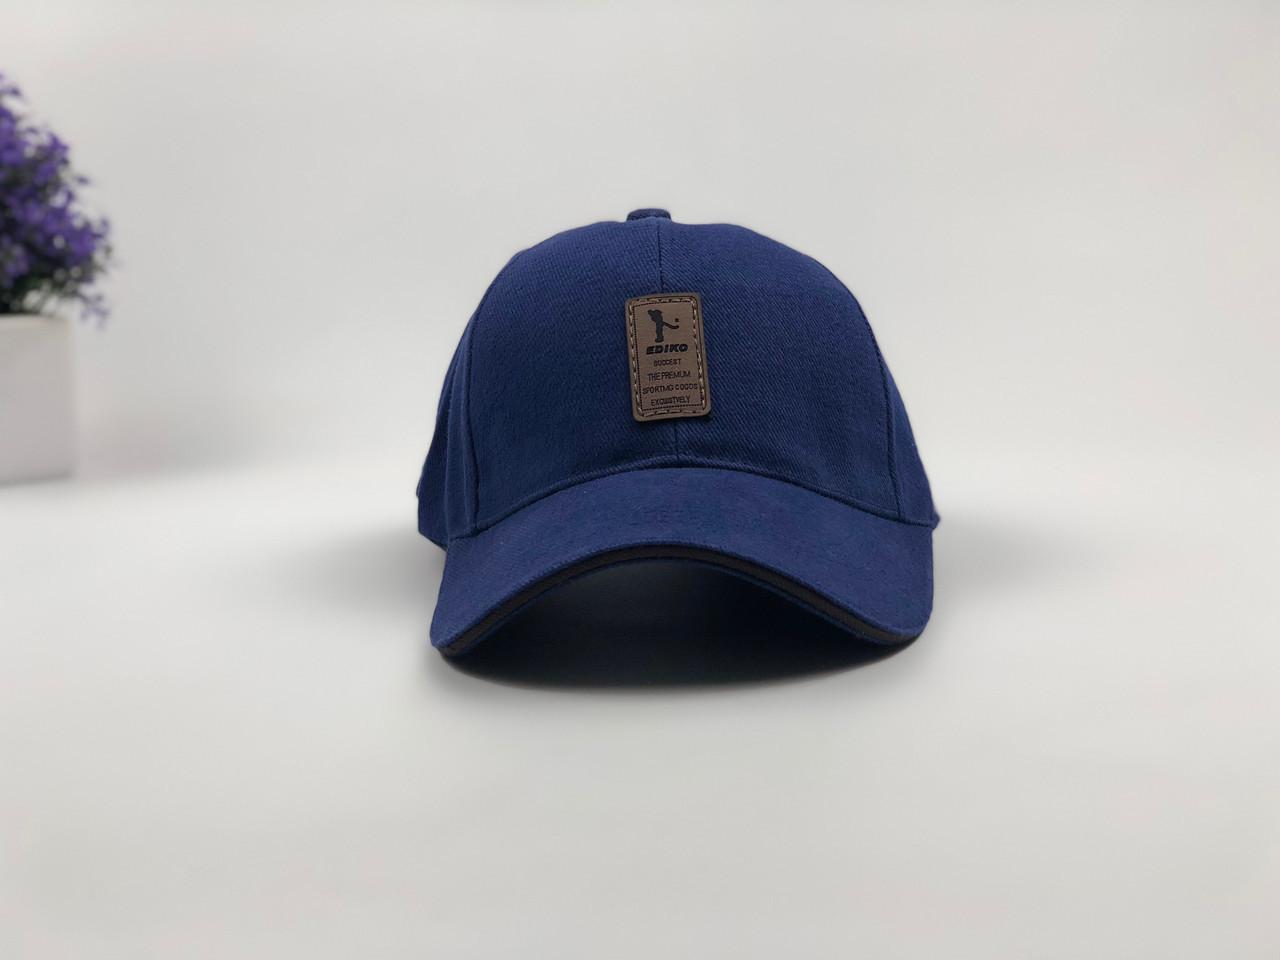 Кепка бейсболка Ediko (синяя)